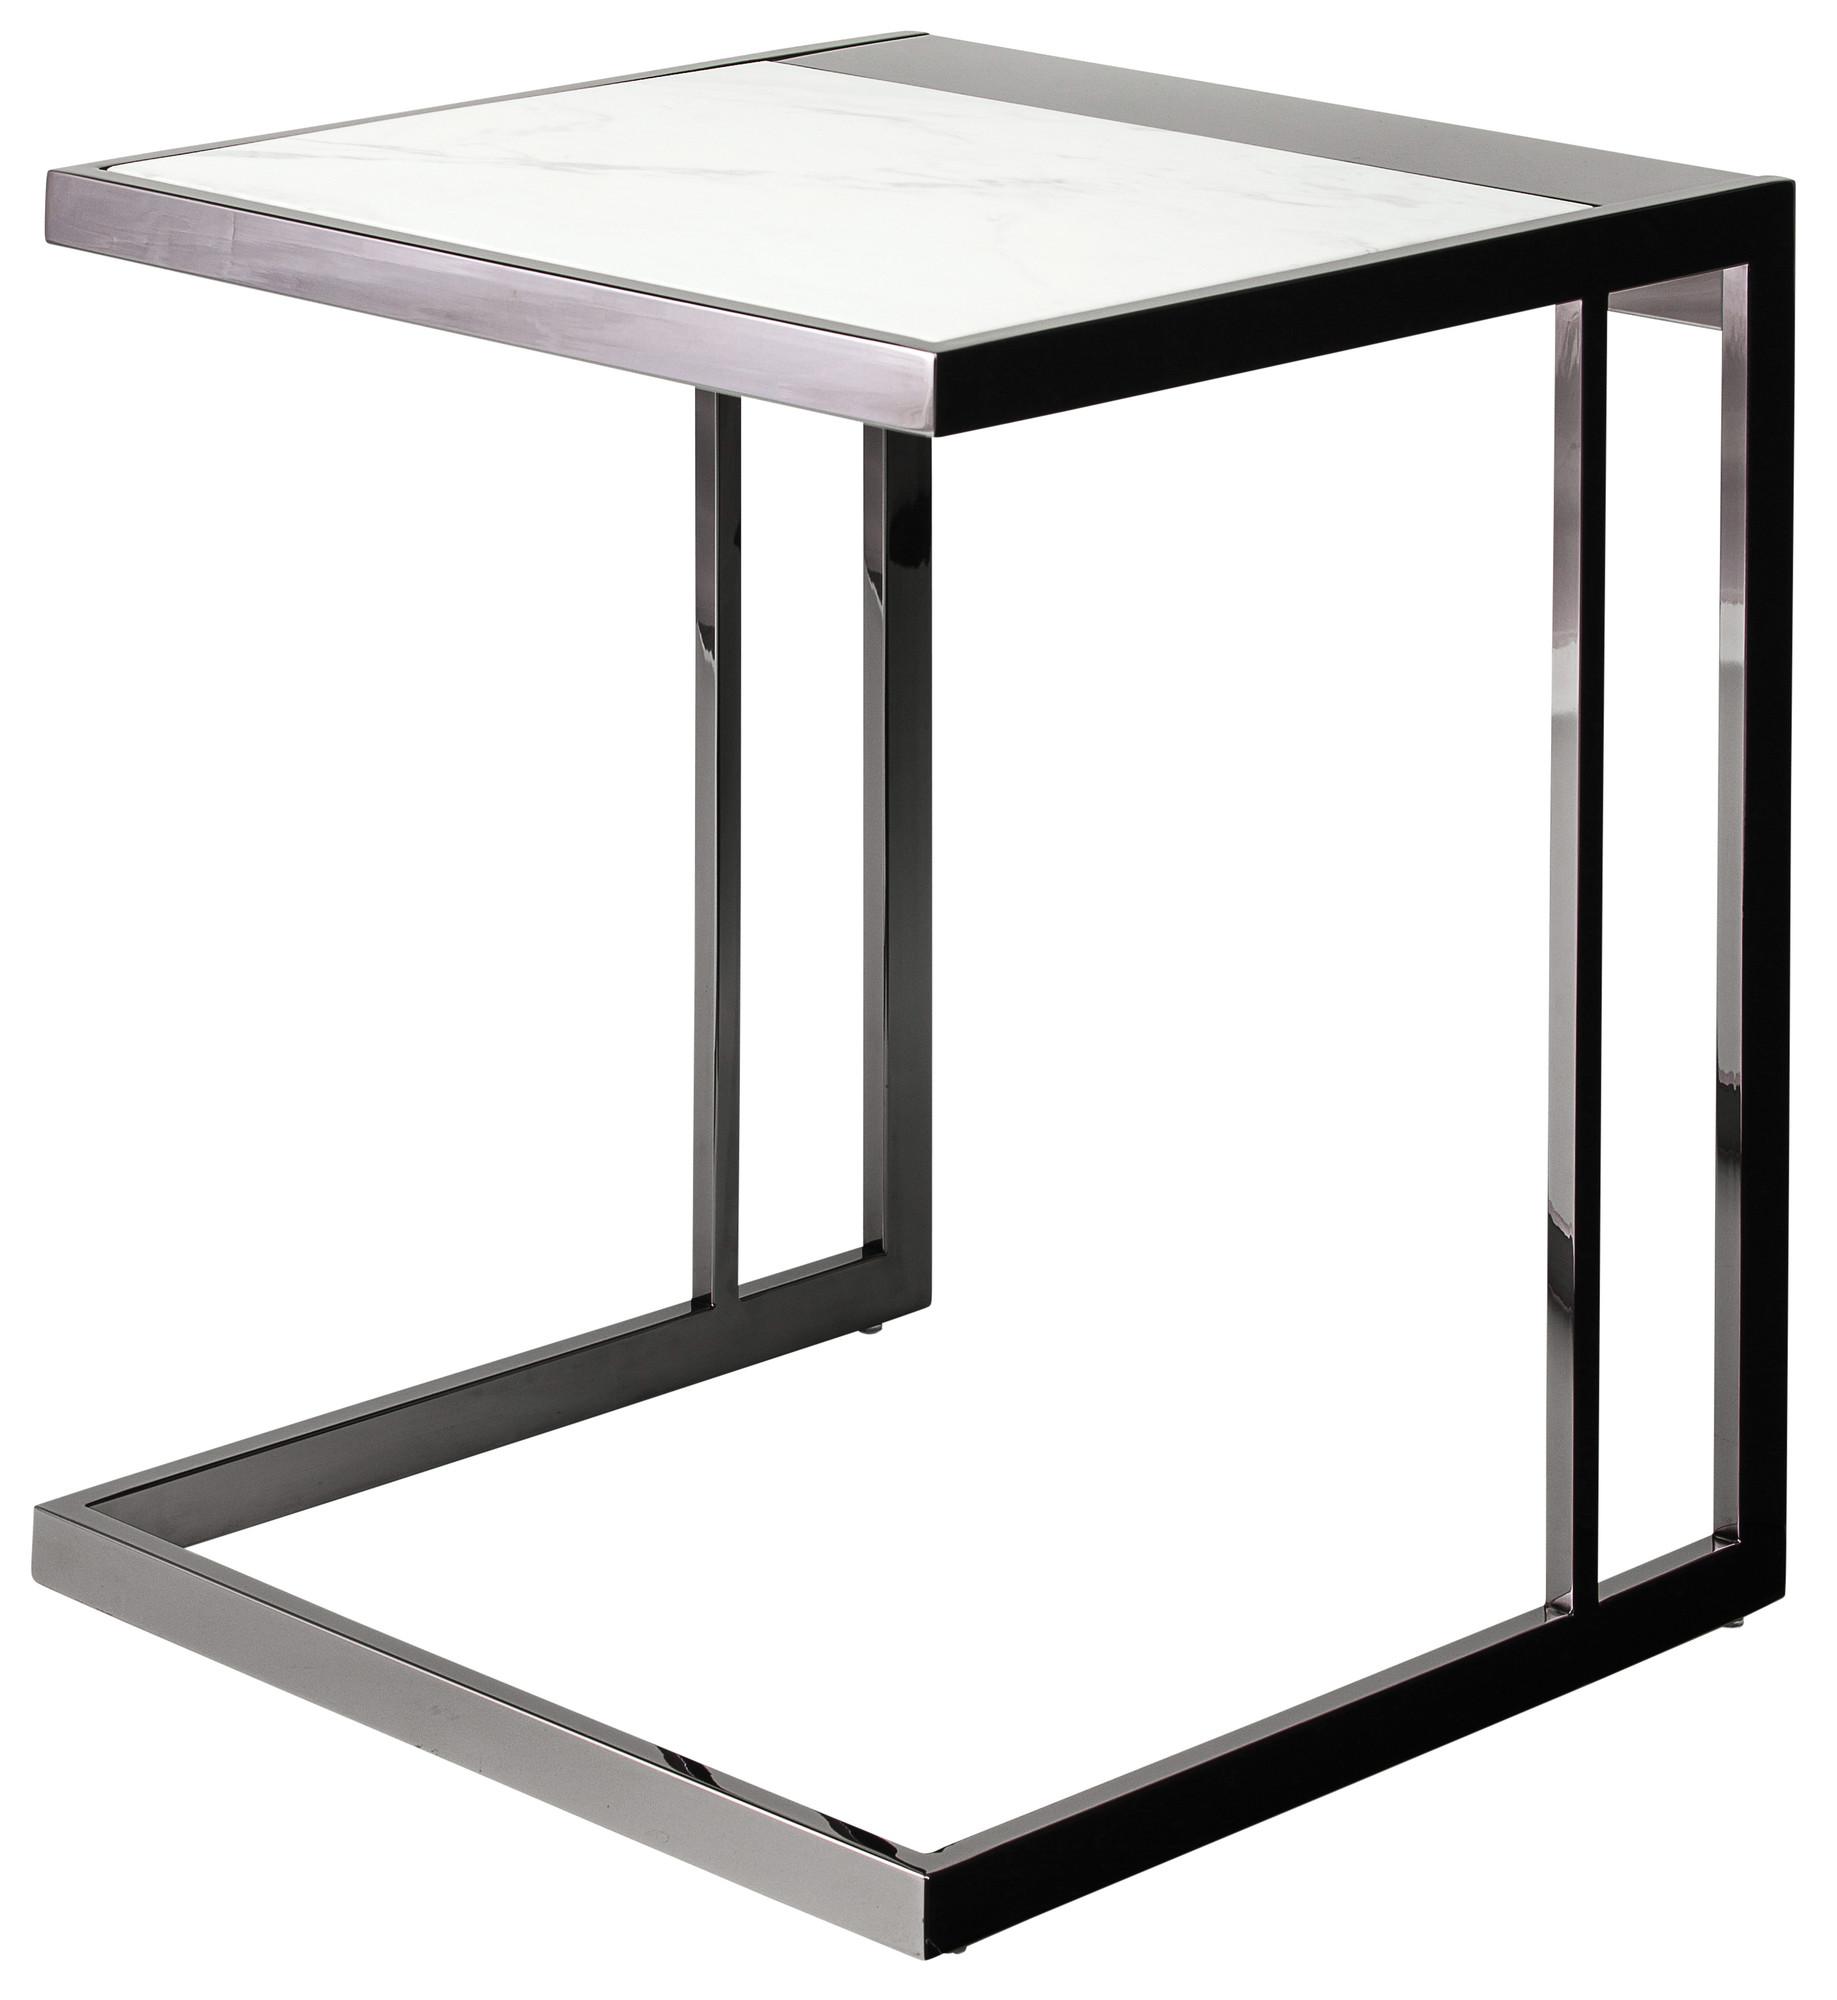 ethan-black-side-table.jpg